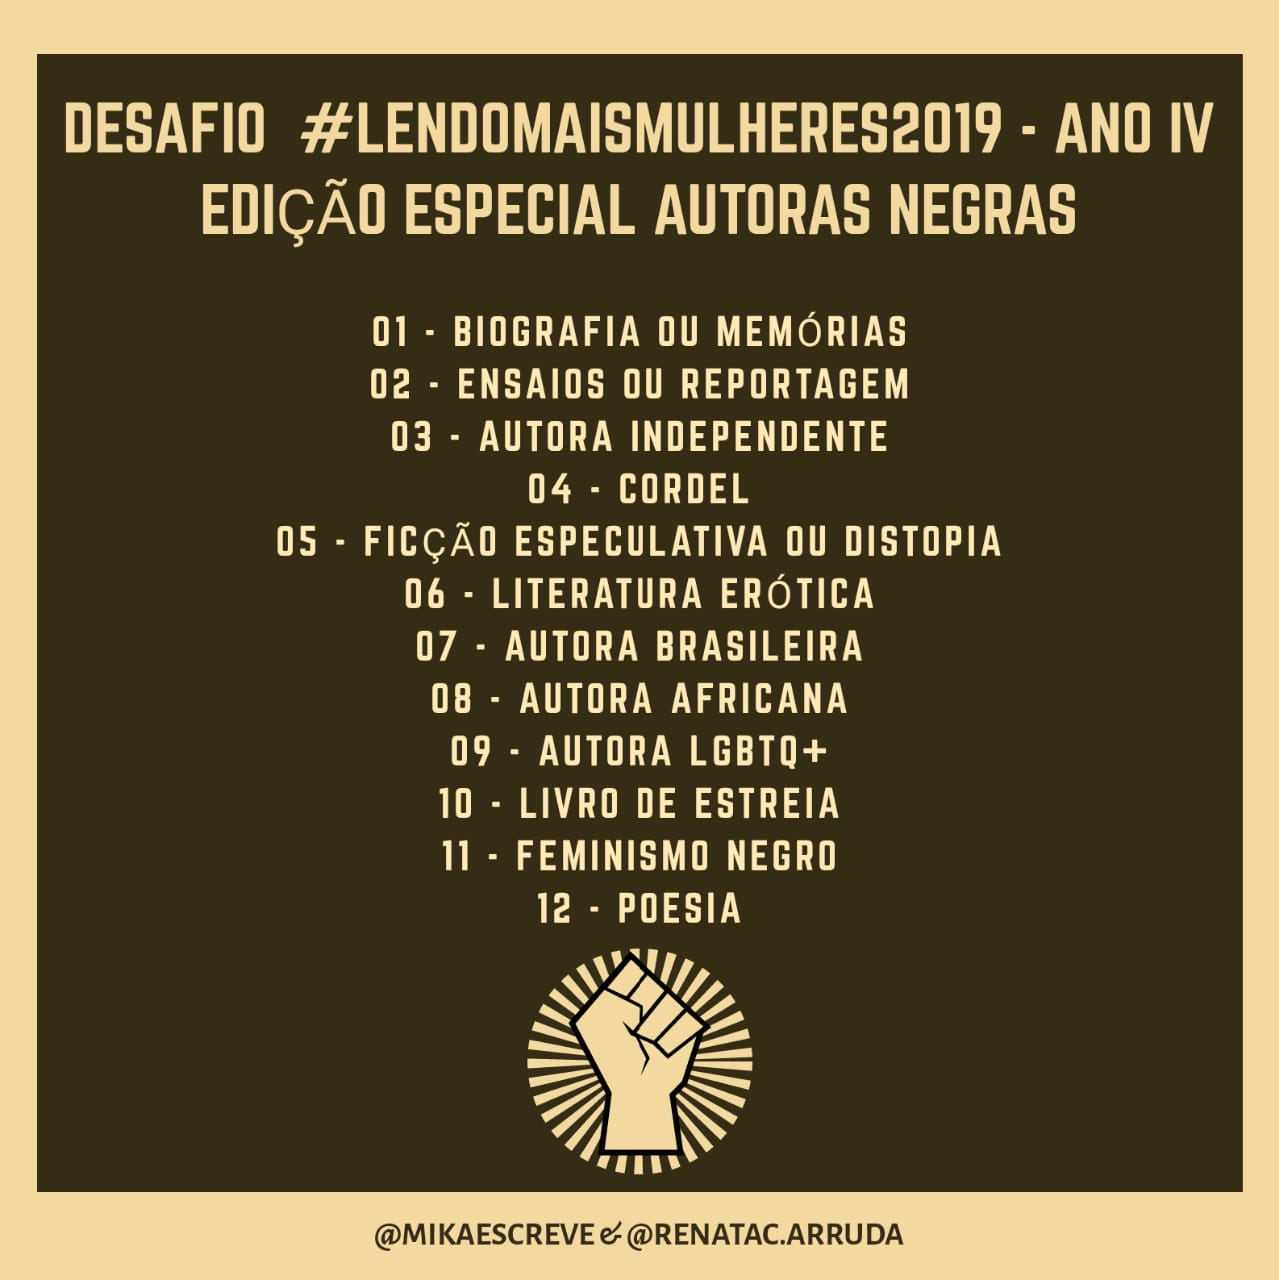 #LendoMaisMulheres2019